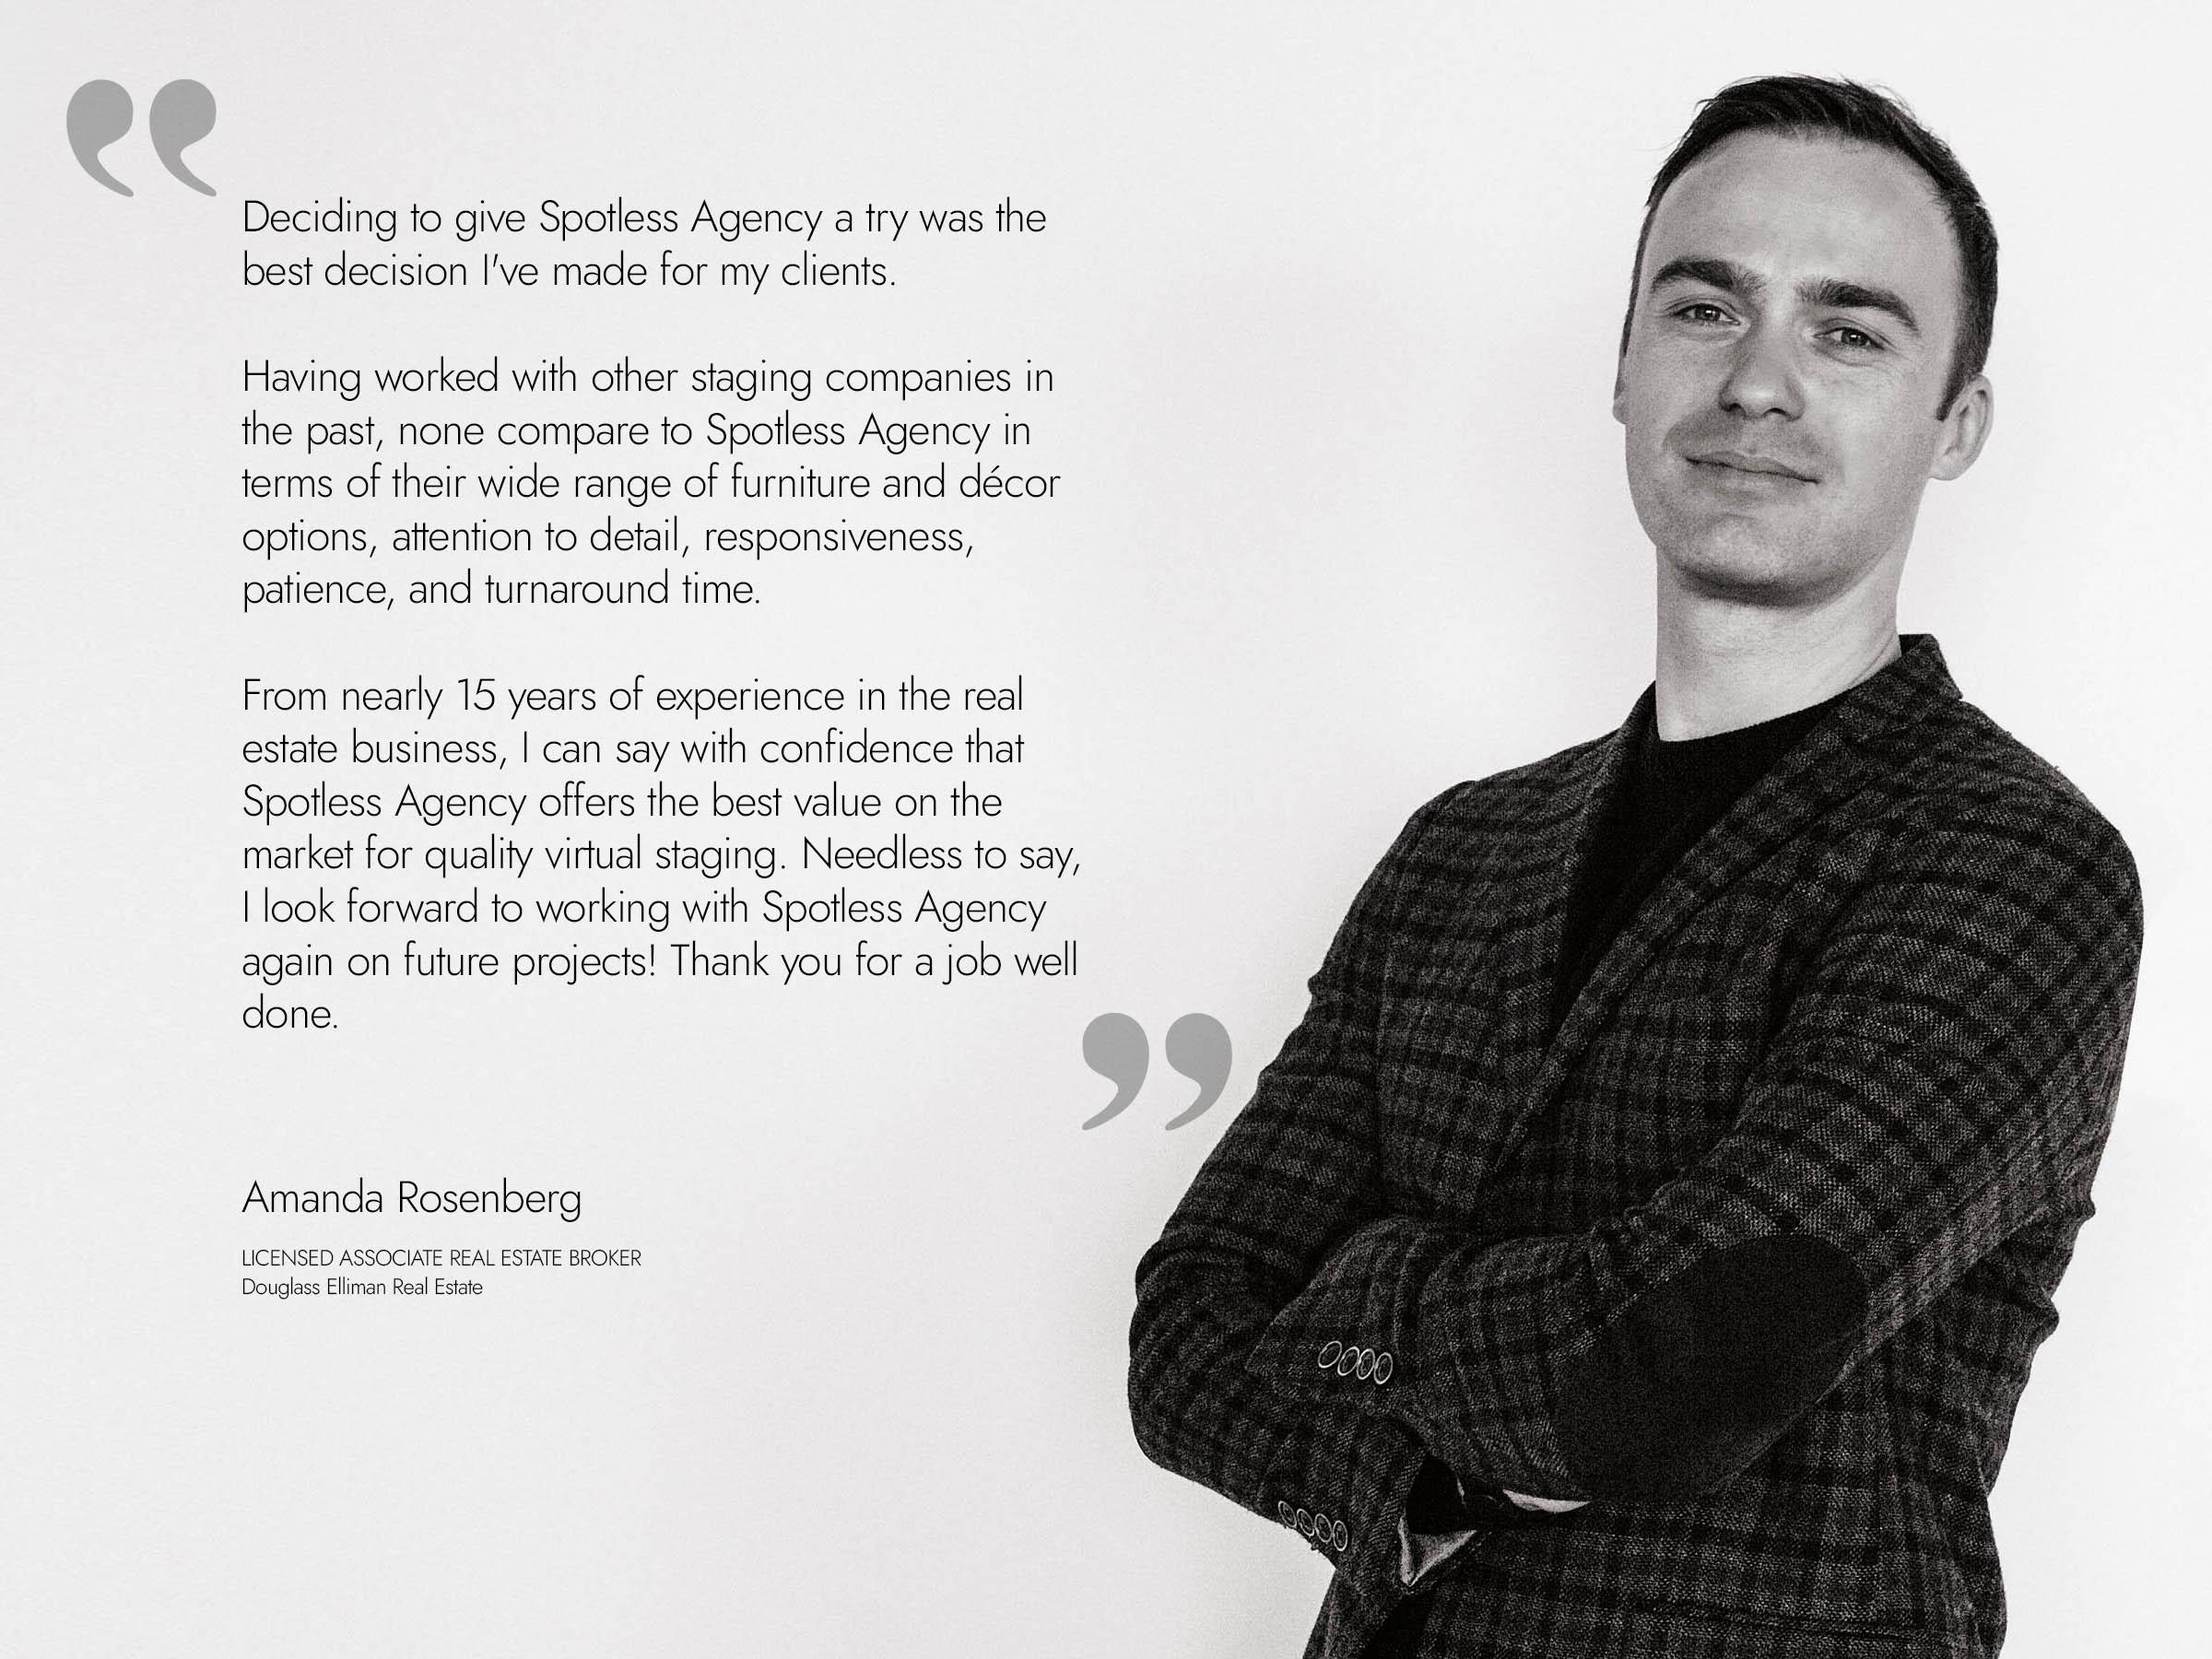 Andrew Zlobin. CEO/Founder of Spotless Agency.